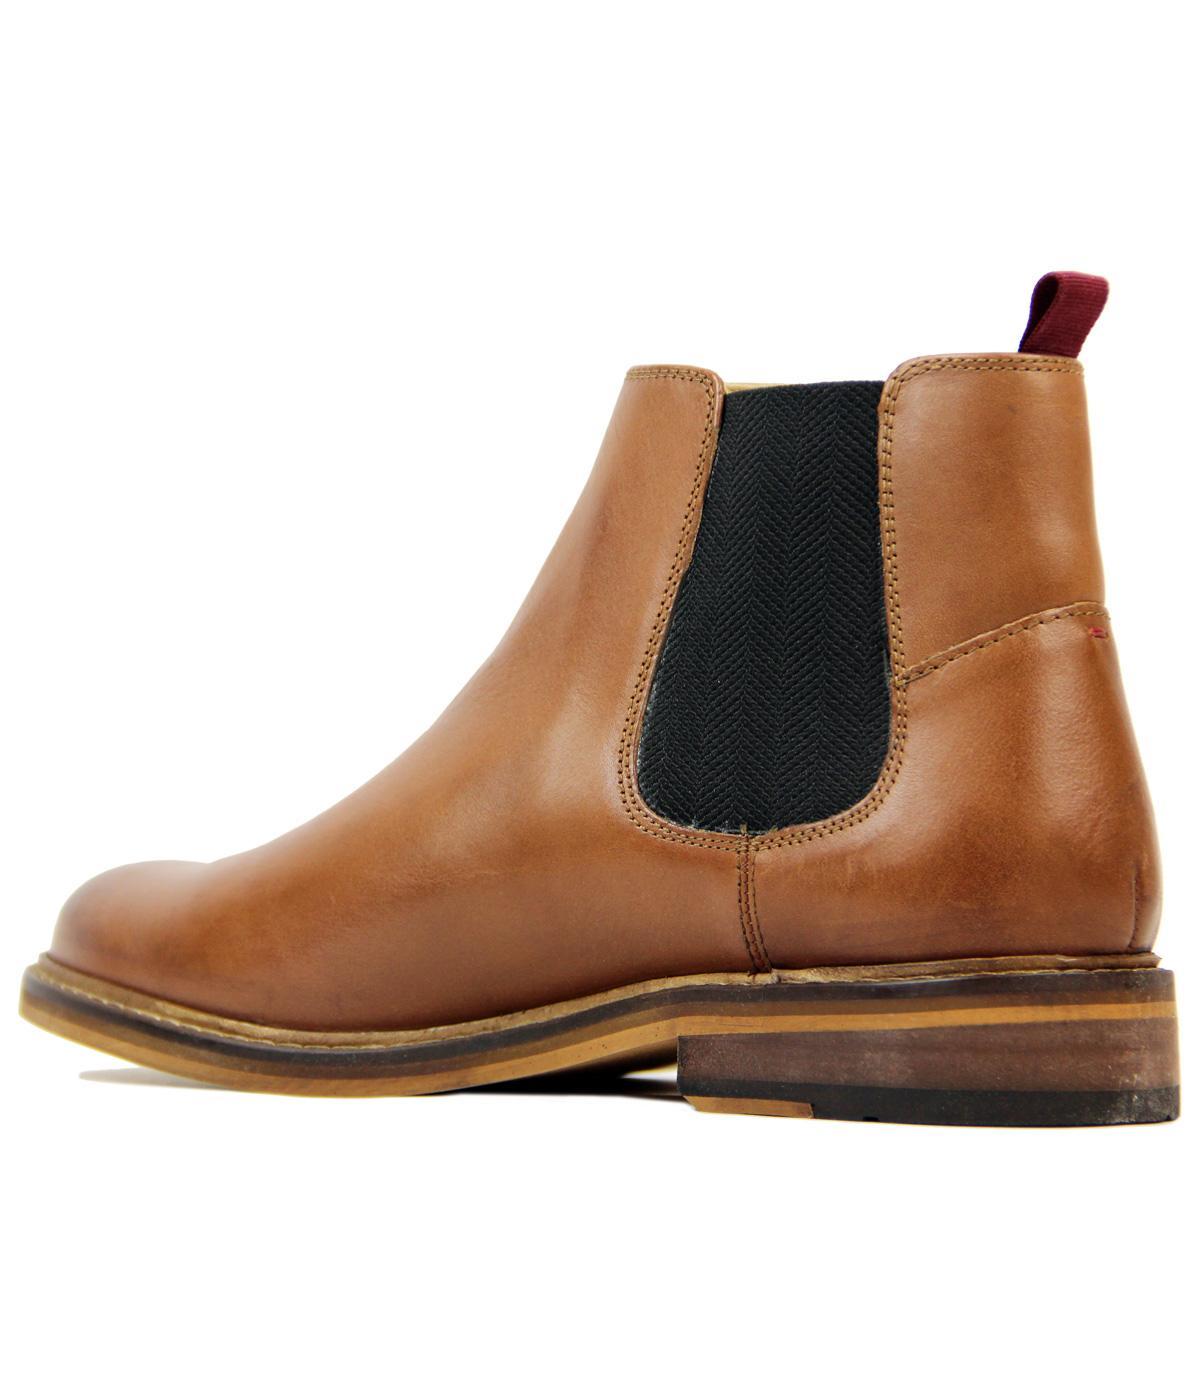 a1991ac31e2 Deon BEN SHERMAN Retro Mod Leather Chelsea Boots